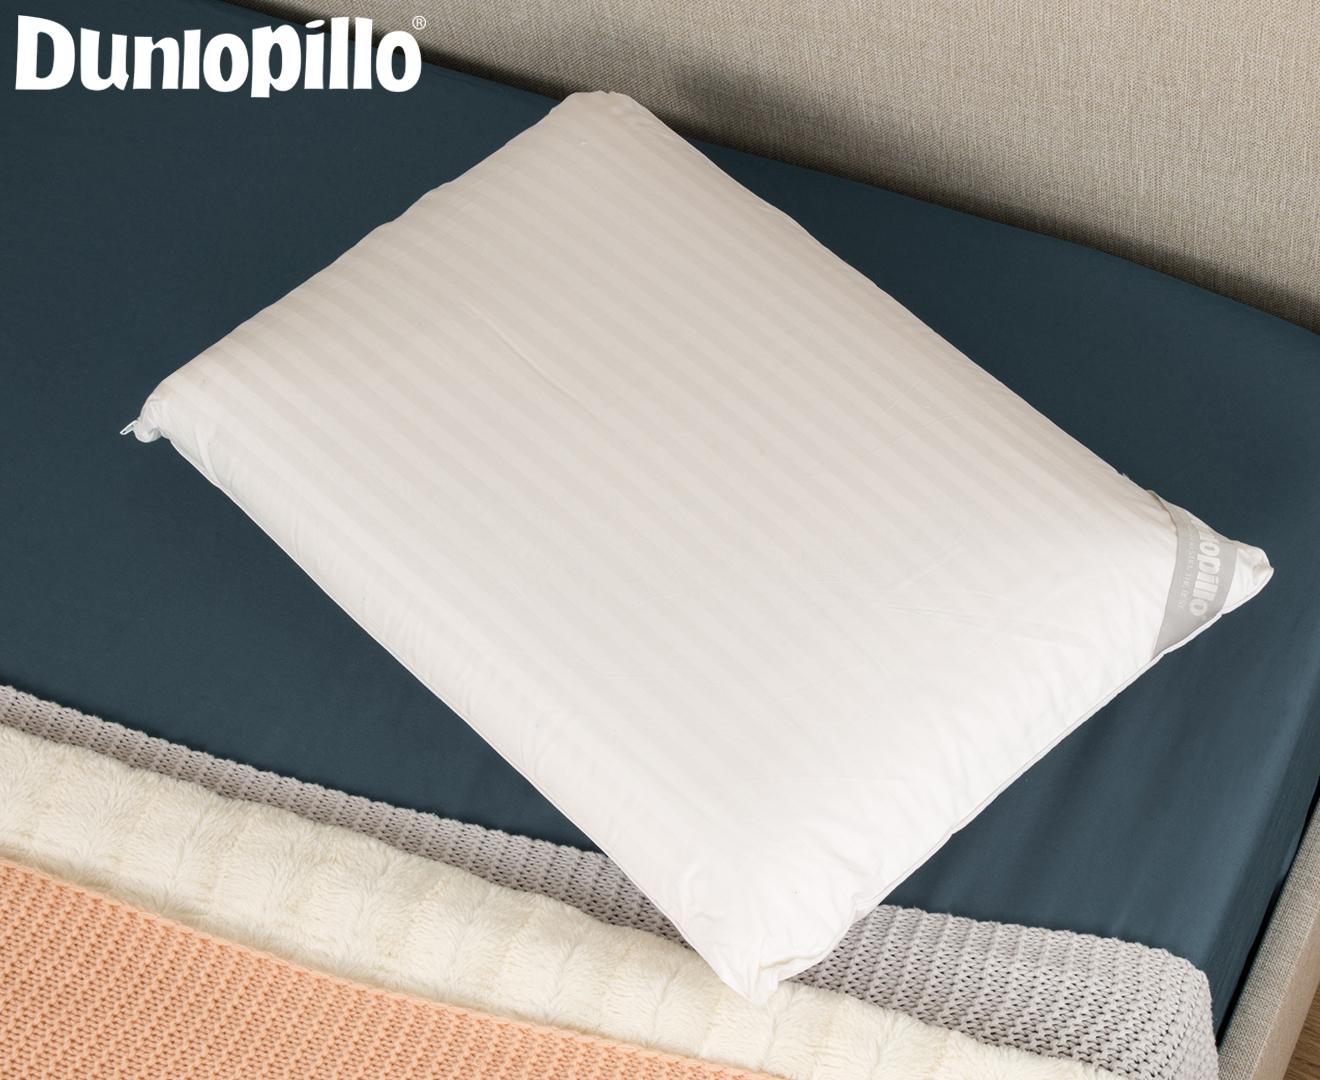 Dunlopillo Luxurious Latex High Profile Amp Firm Feel Pillow